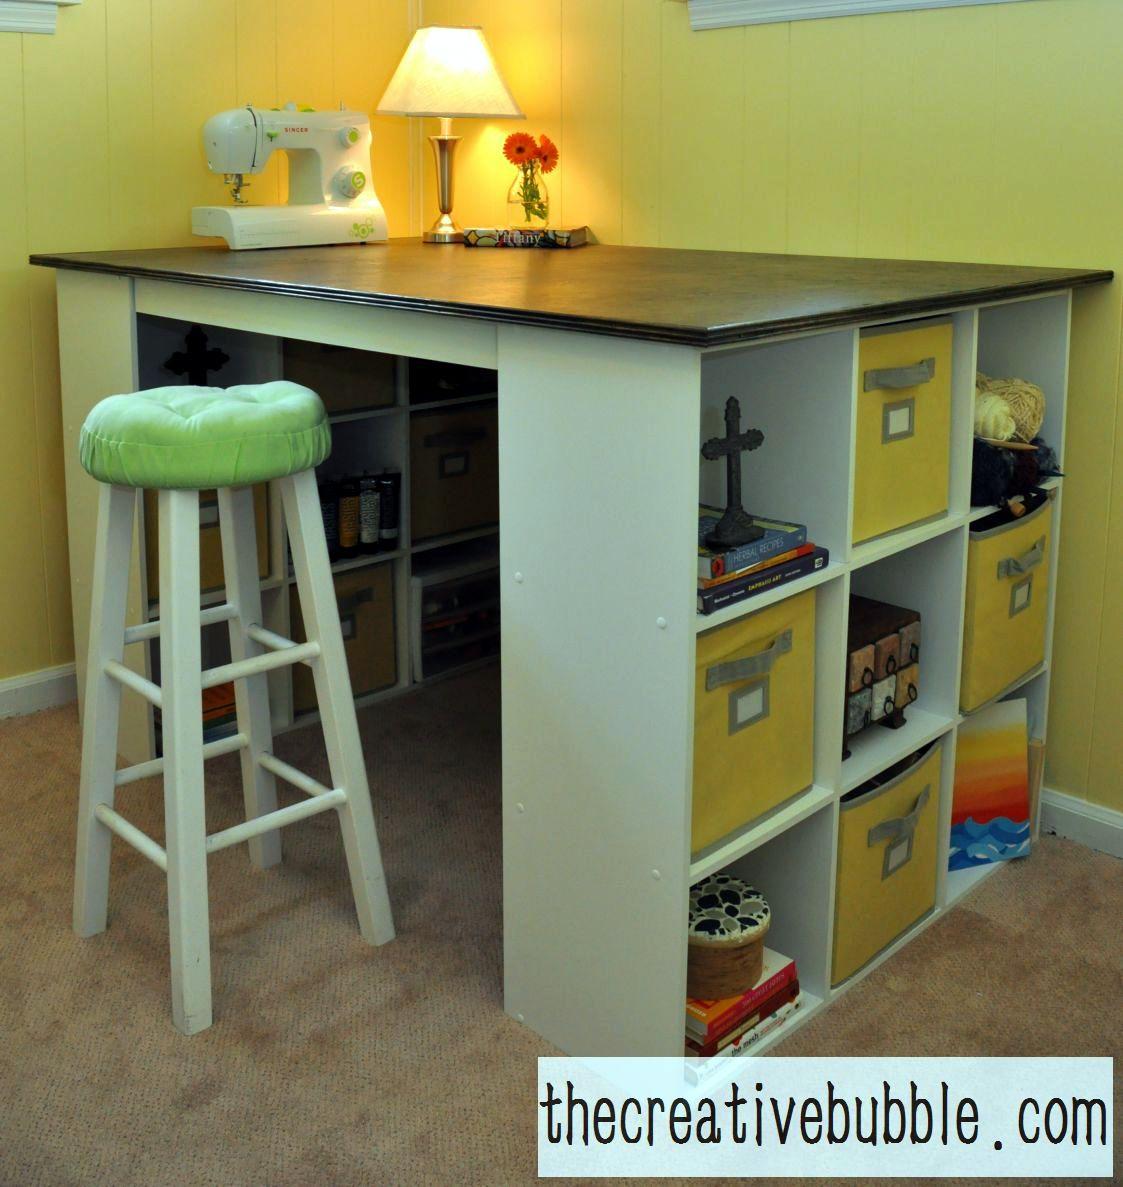 Make your own craft table - Make Your Own Craft Table